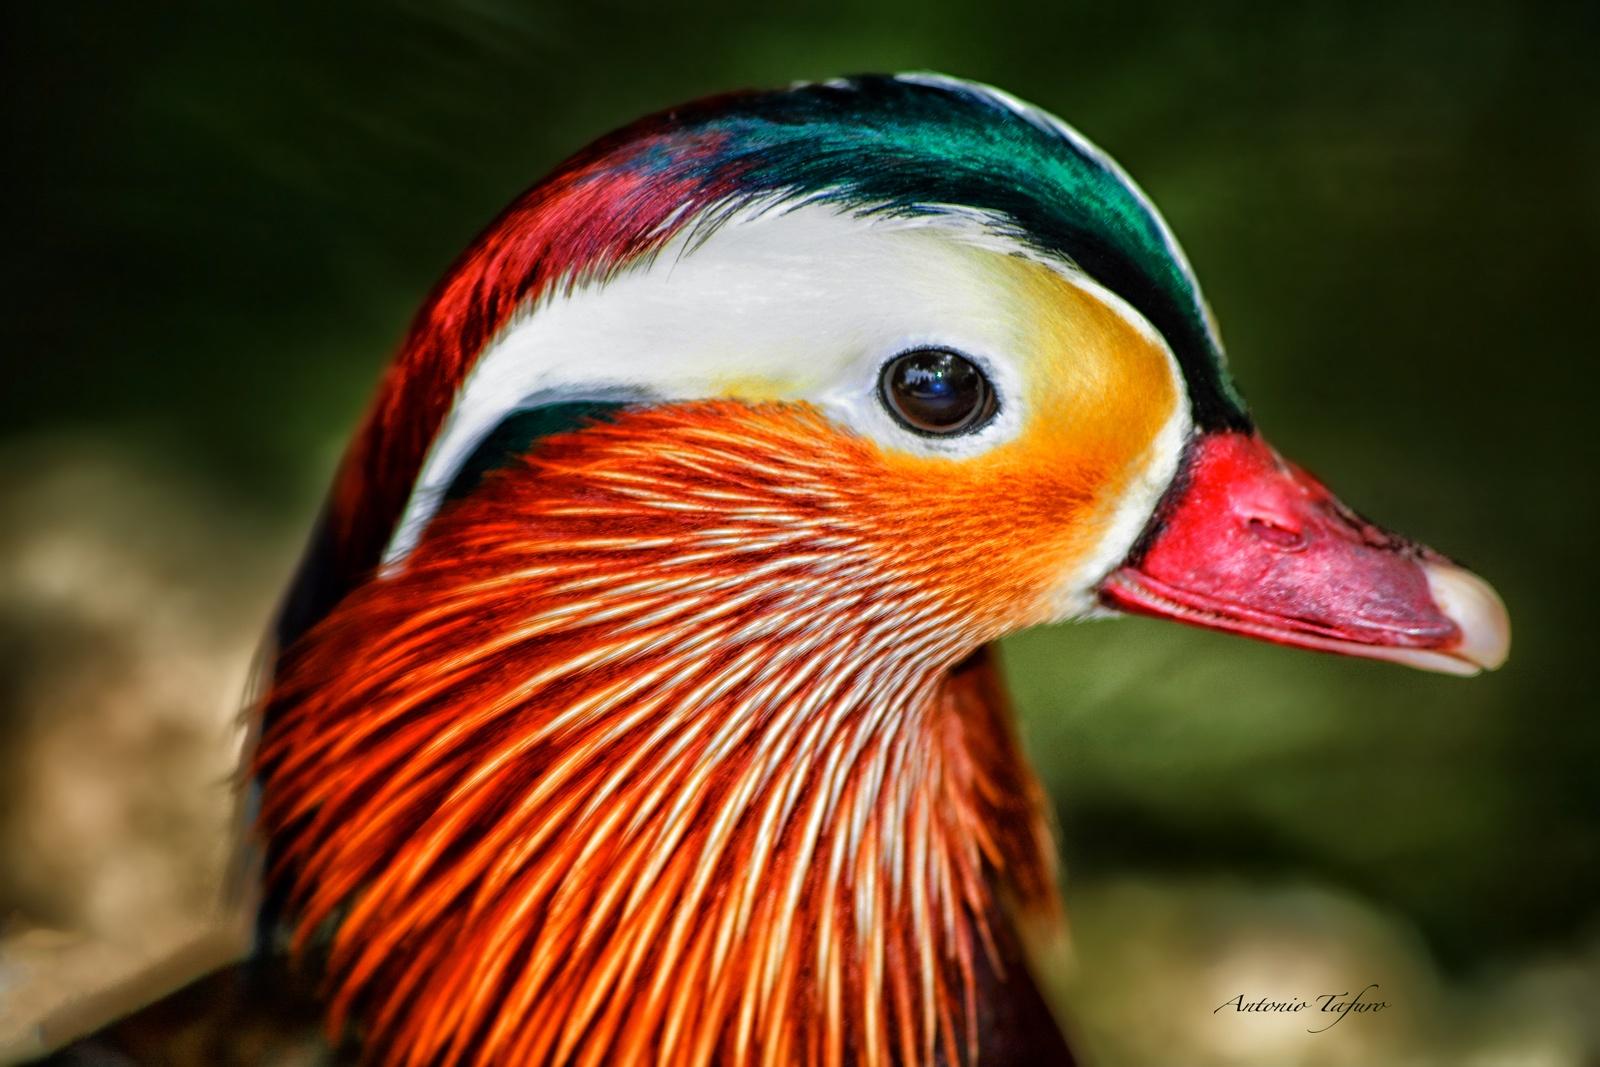 mandarin duck by Antonio Tafuro